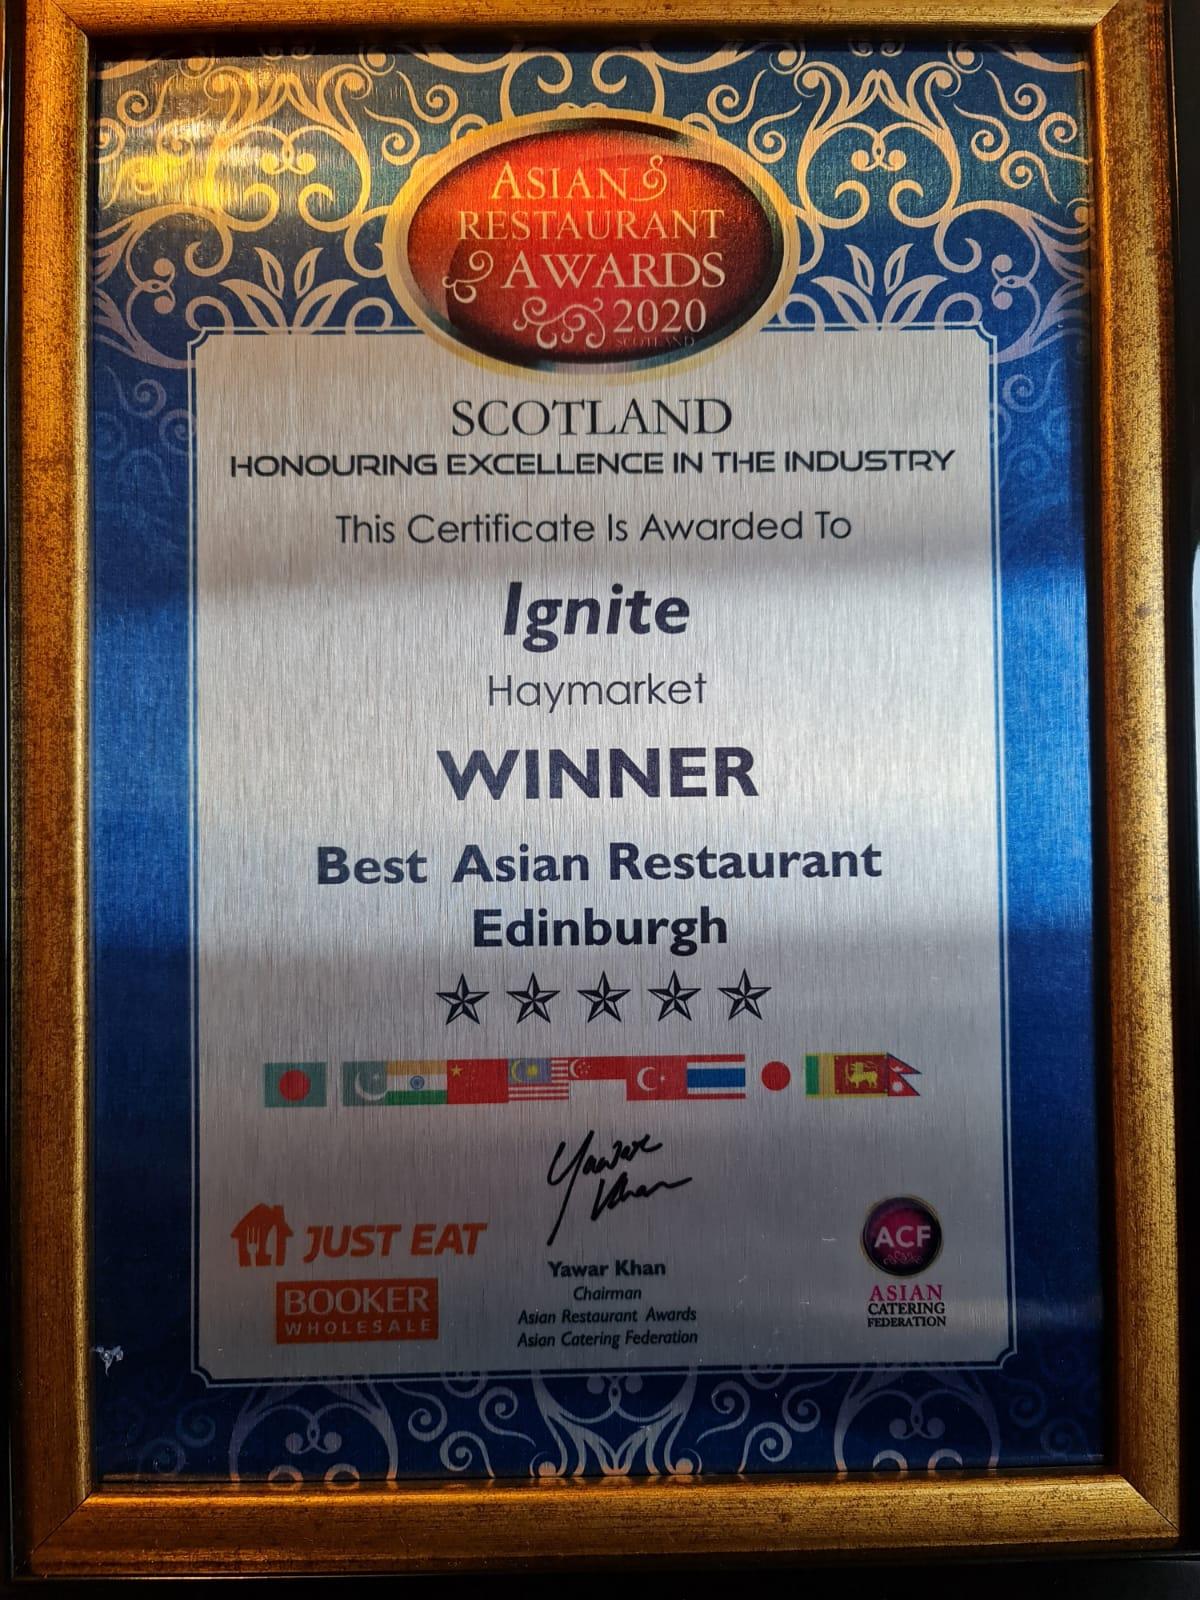 Best Asian Restaurant Edinburgh